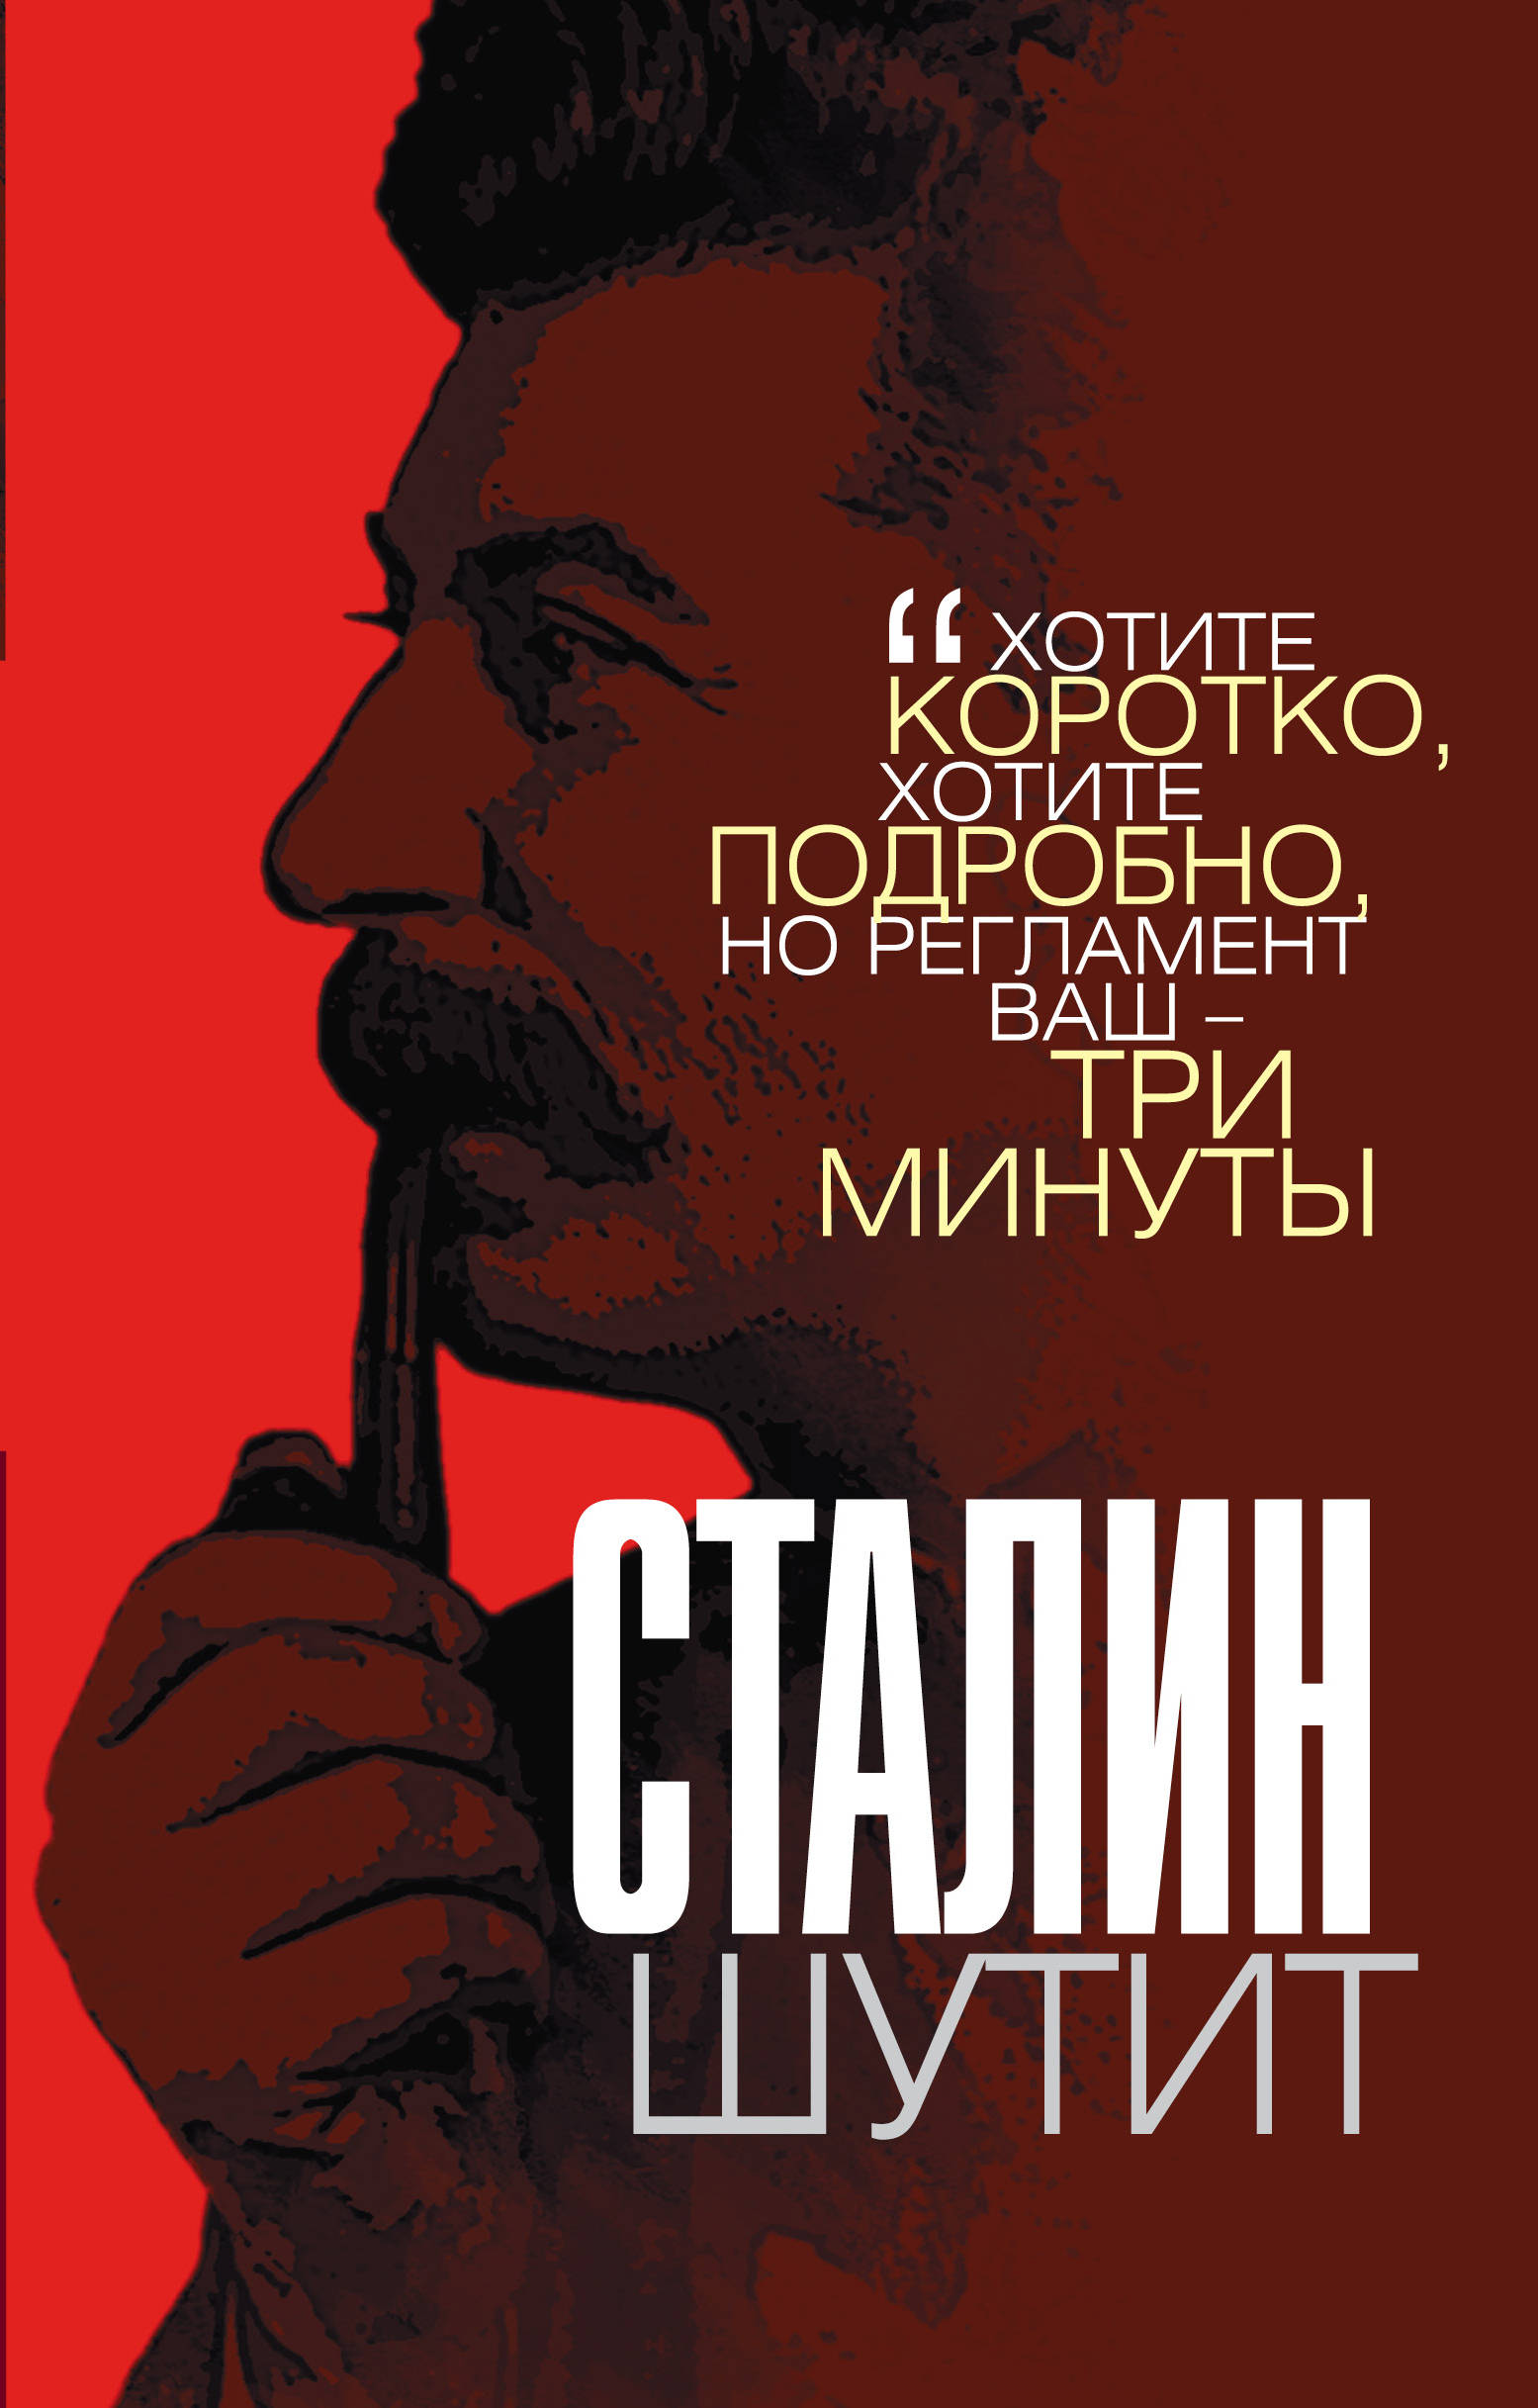 Stalin shutit